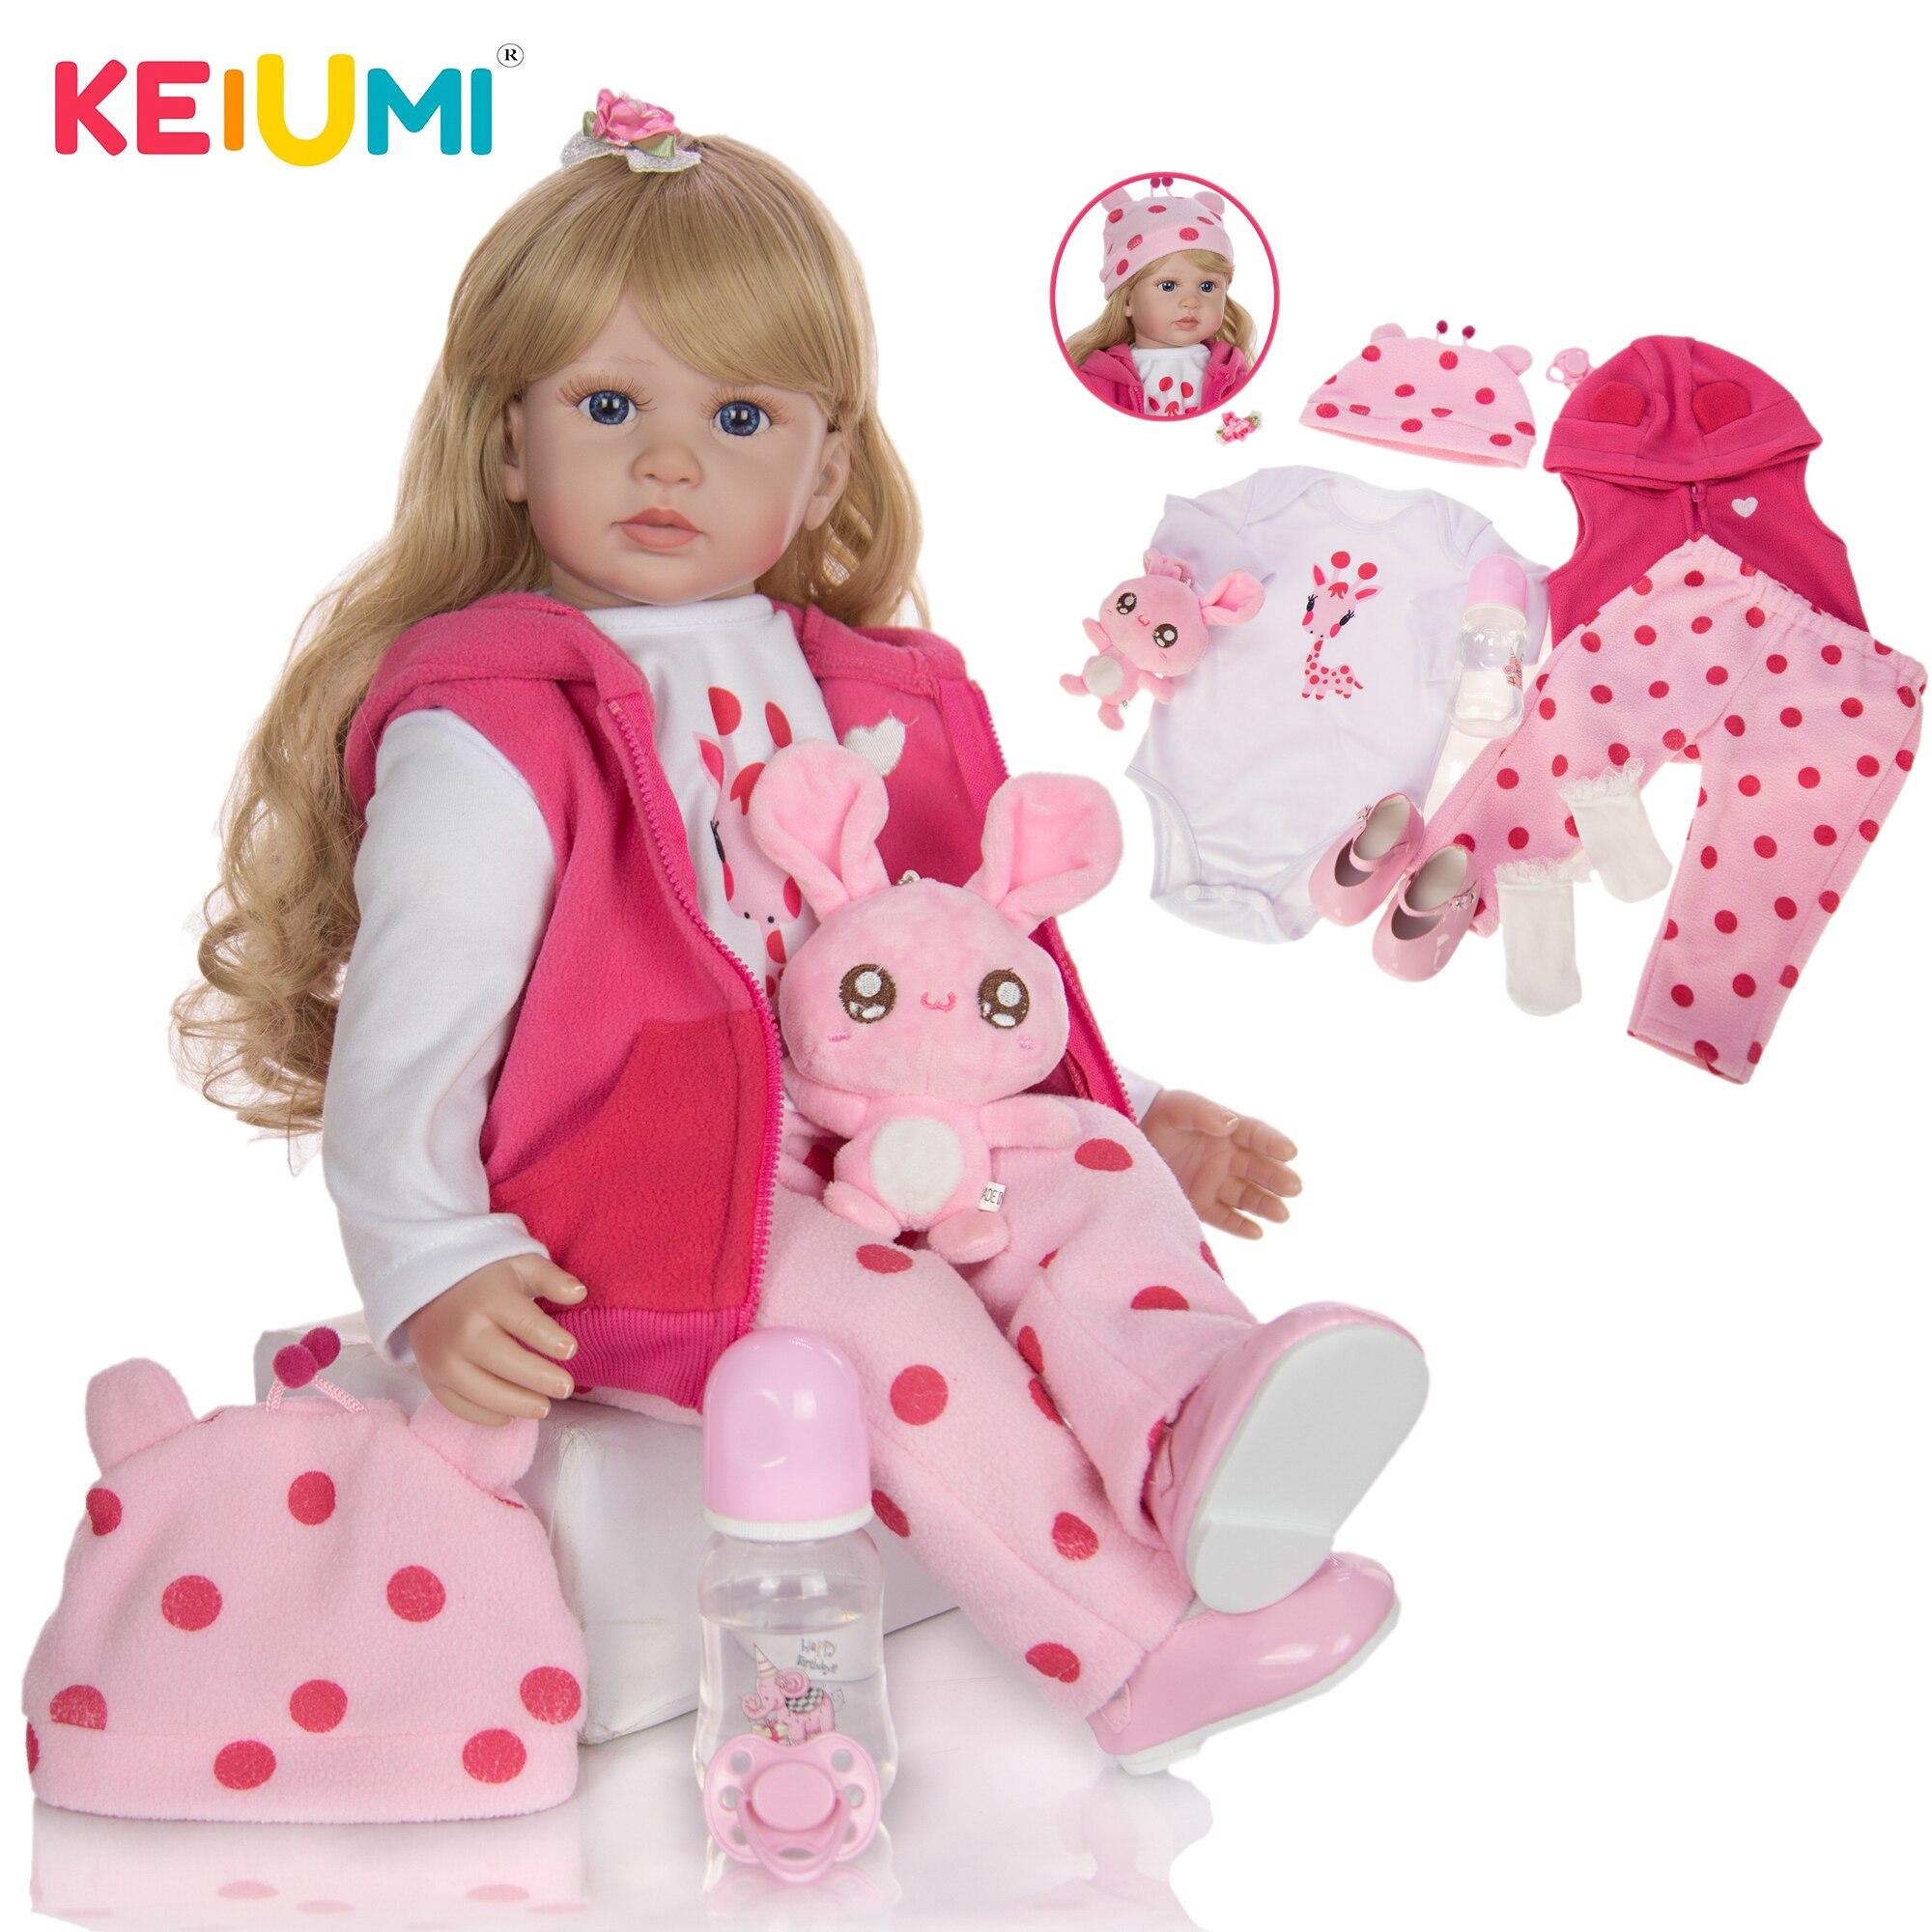 KEIUMI 24 Inch Lovely Reborn Baby Dolls 60 cm Soft Cloth Body Vinyl Gold Curls Baby Doll Reborns Toys For Children's Day Present